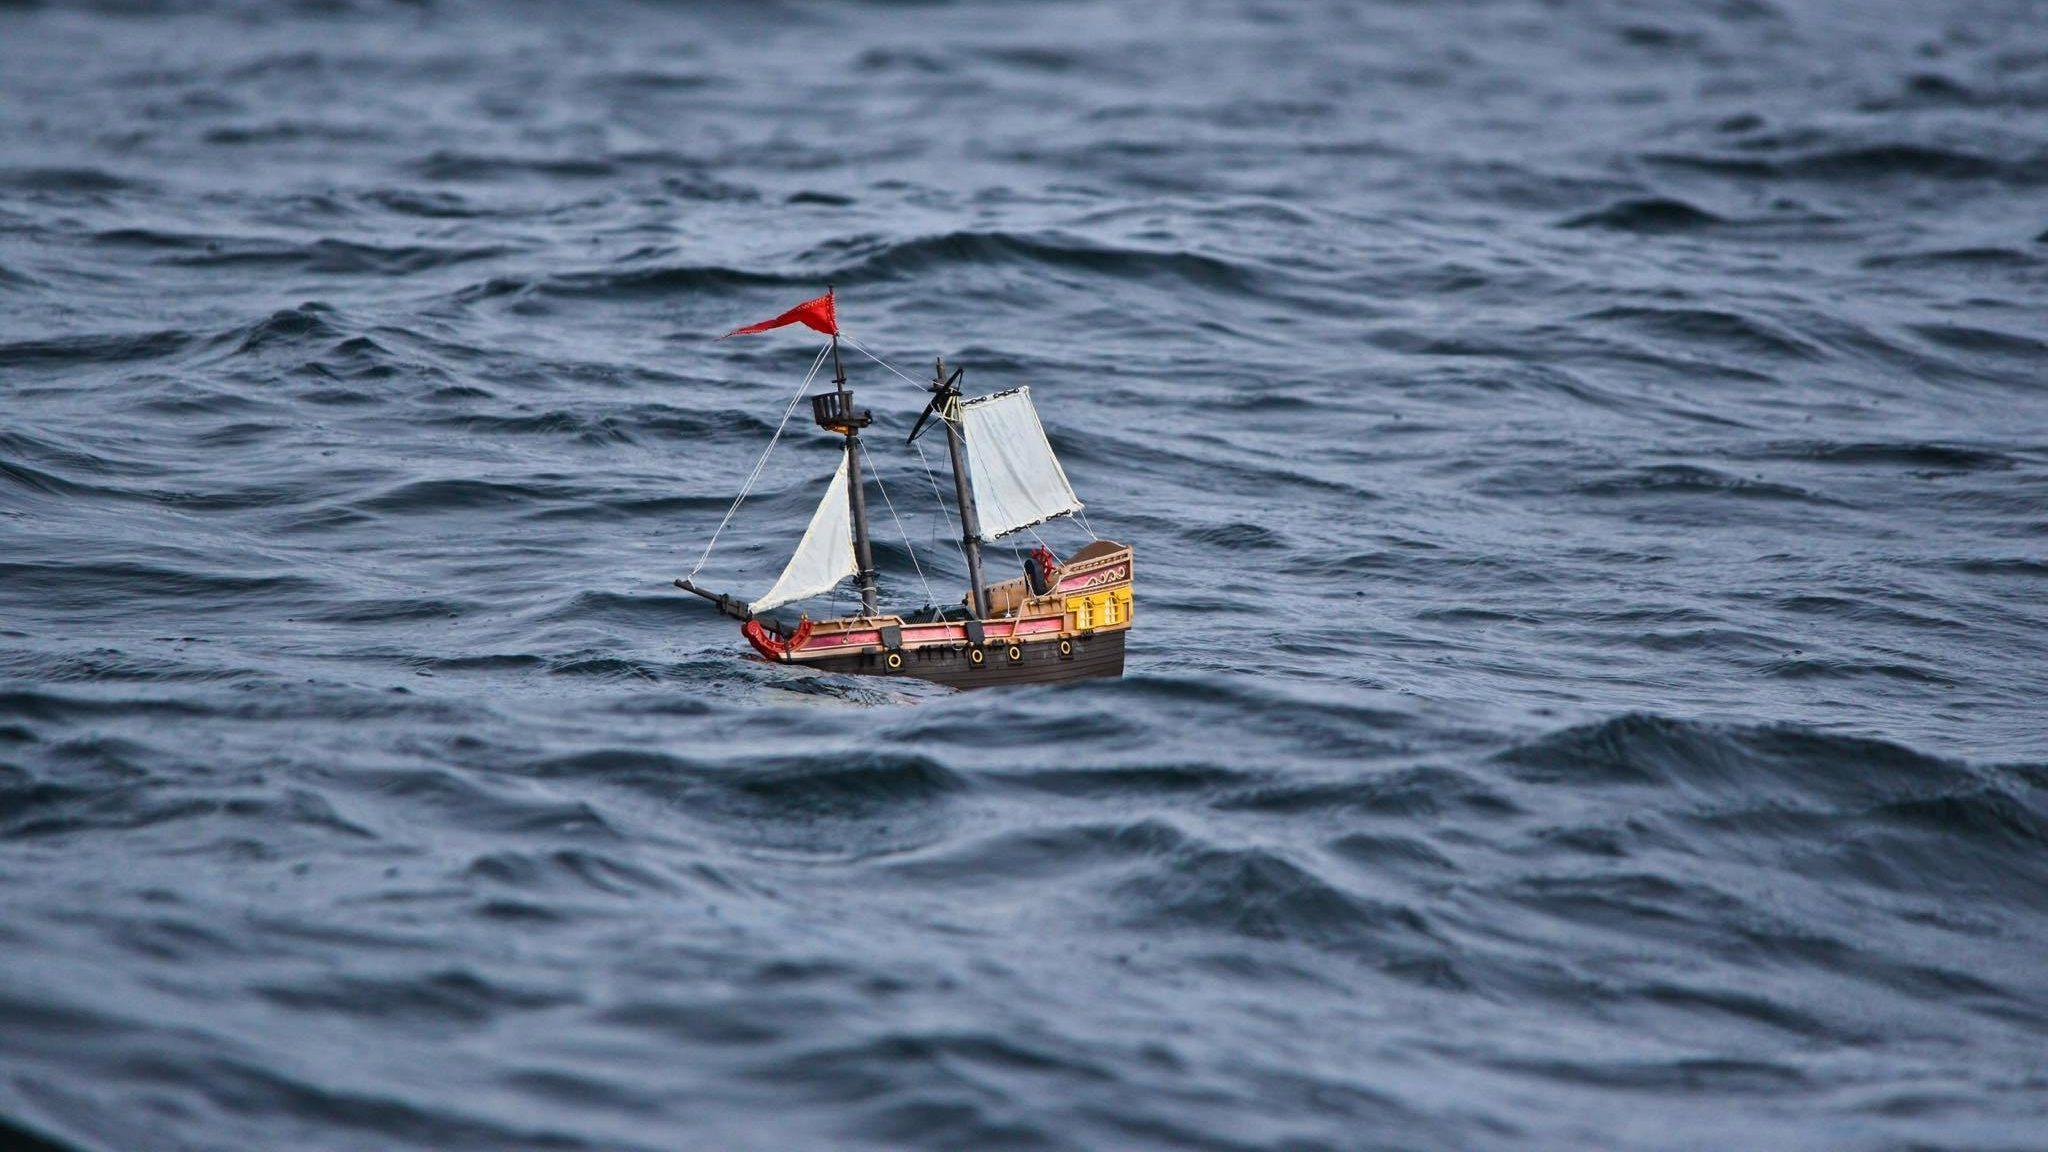 HMS Adventure sailing the Atlantic Ocean